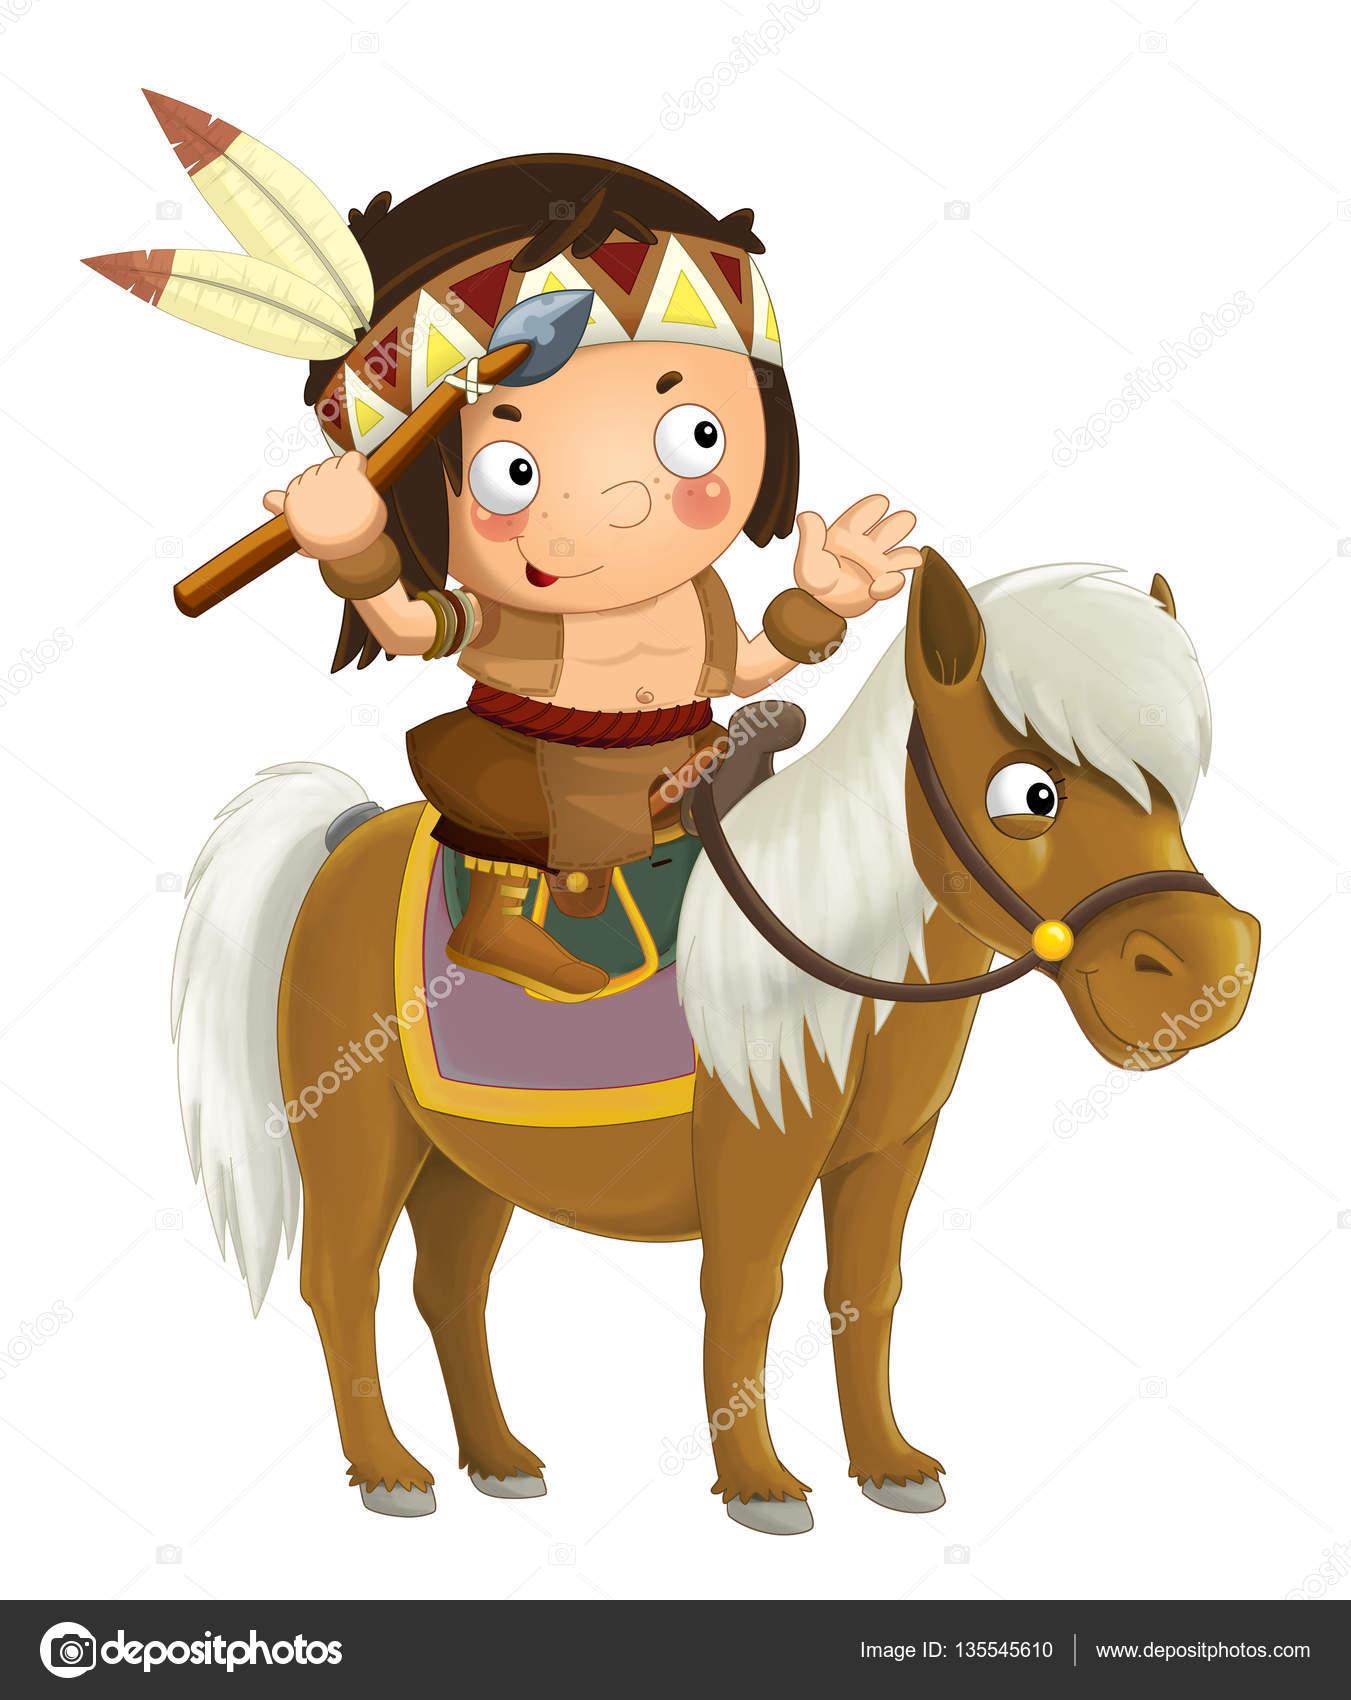 Kresk wka zachodnich indian na koniu zdj cie stockowe illustrator hft 135545610 - Dessin anime indien cheval ...